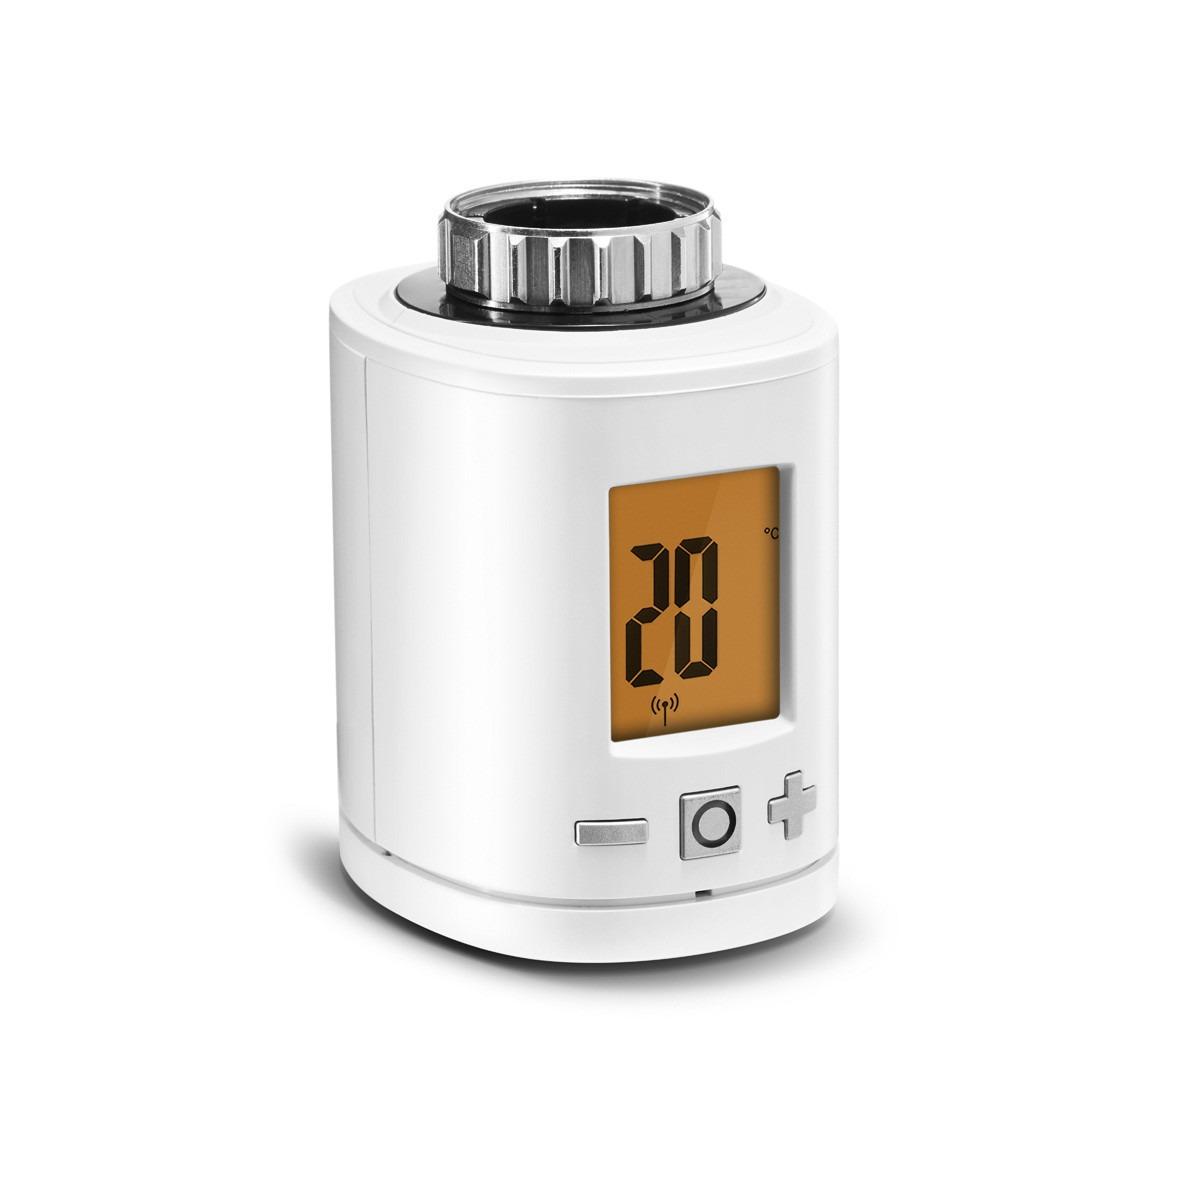 Gigaset Alarm Thermostaatknop Slimme thermostaat Wit